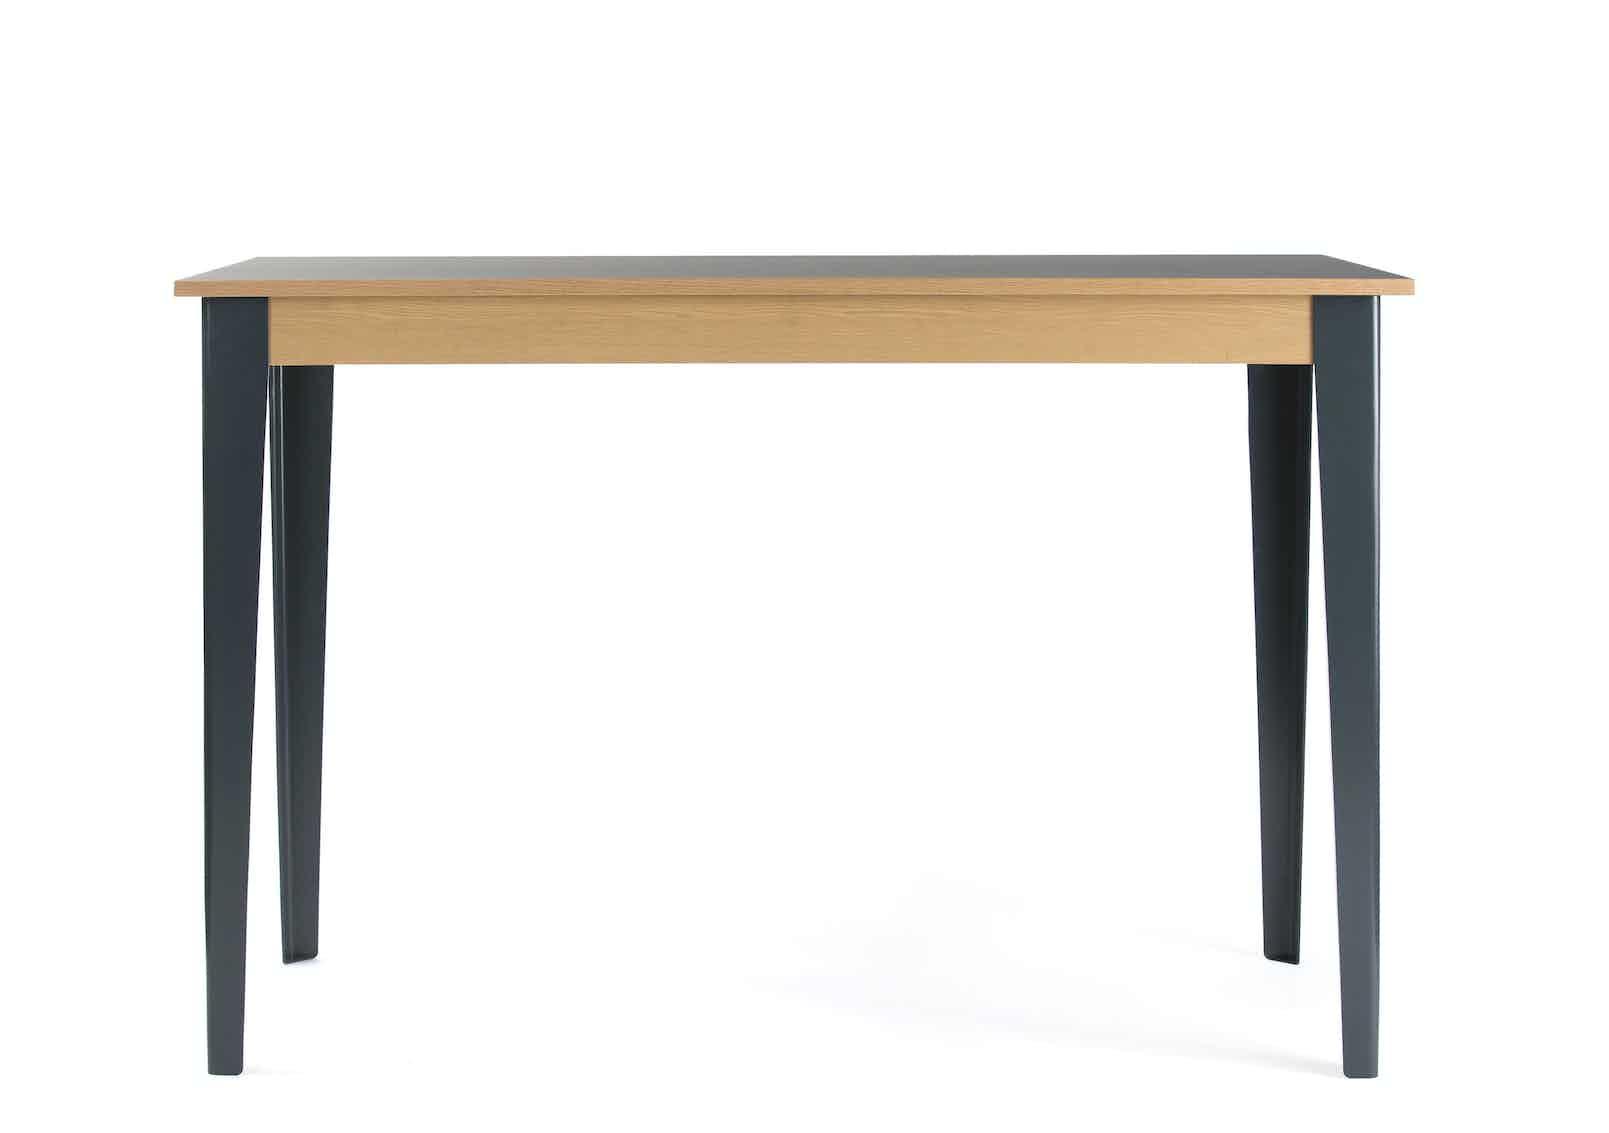 Deadgood-tree-table-tall-front-haute-living